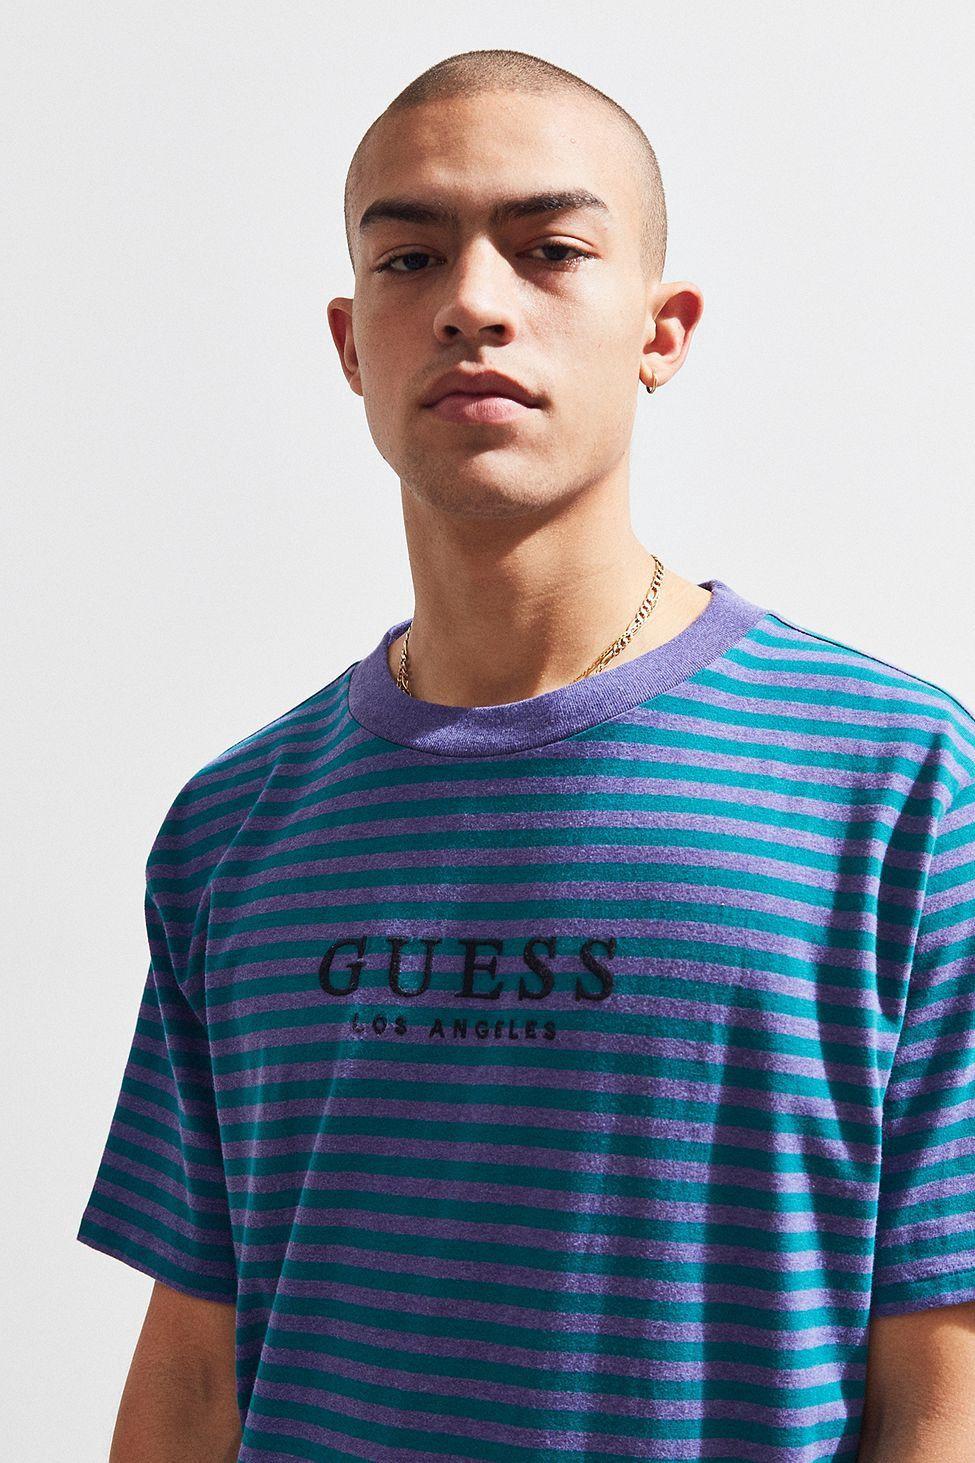 7d15c77c3c94 Urban Outfitters Guess Robertson Stripe Tee - Light Grey Xl ...